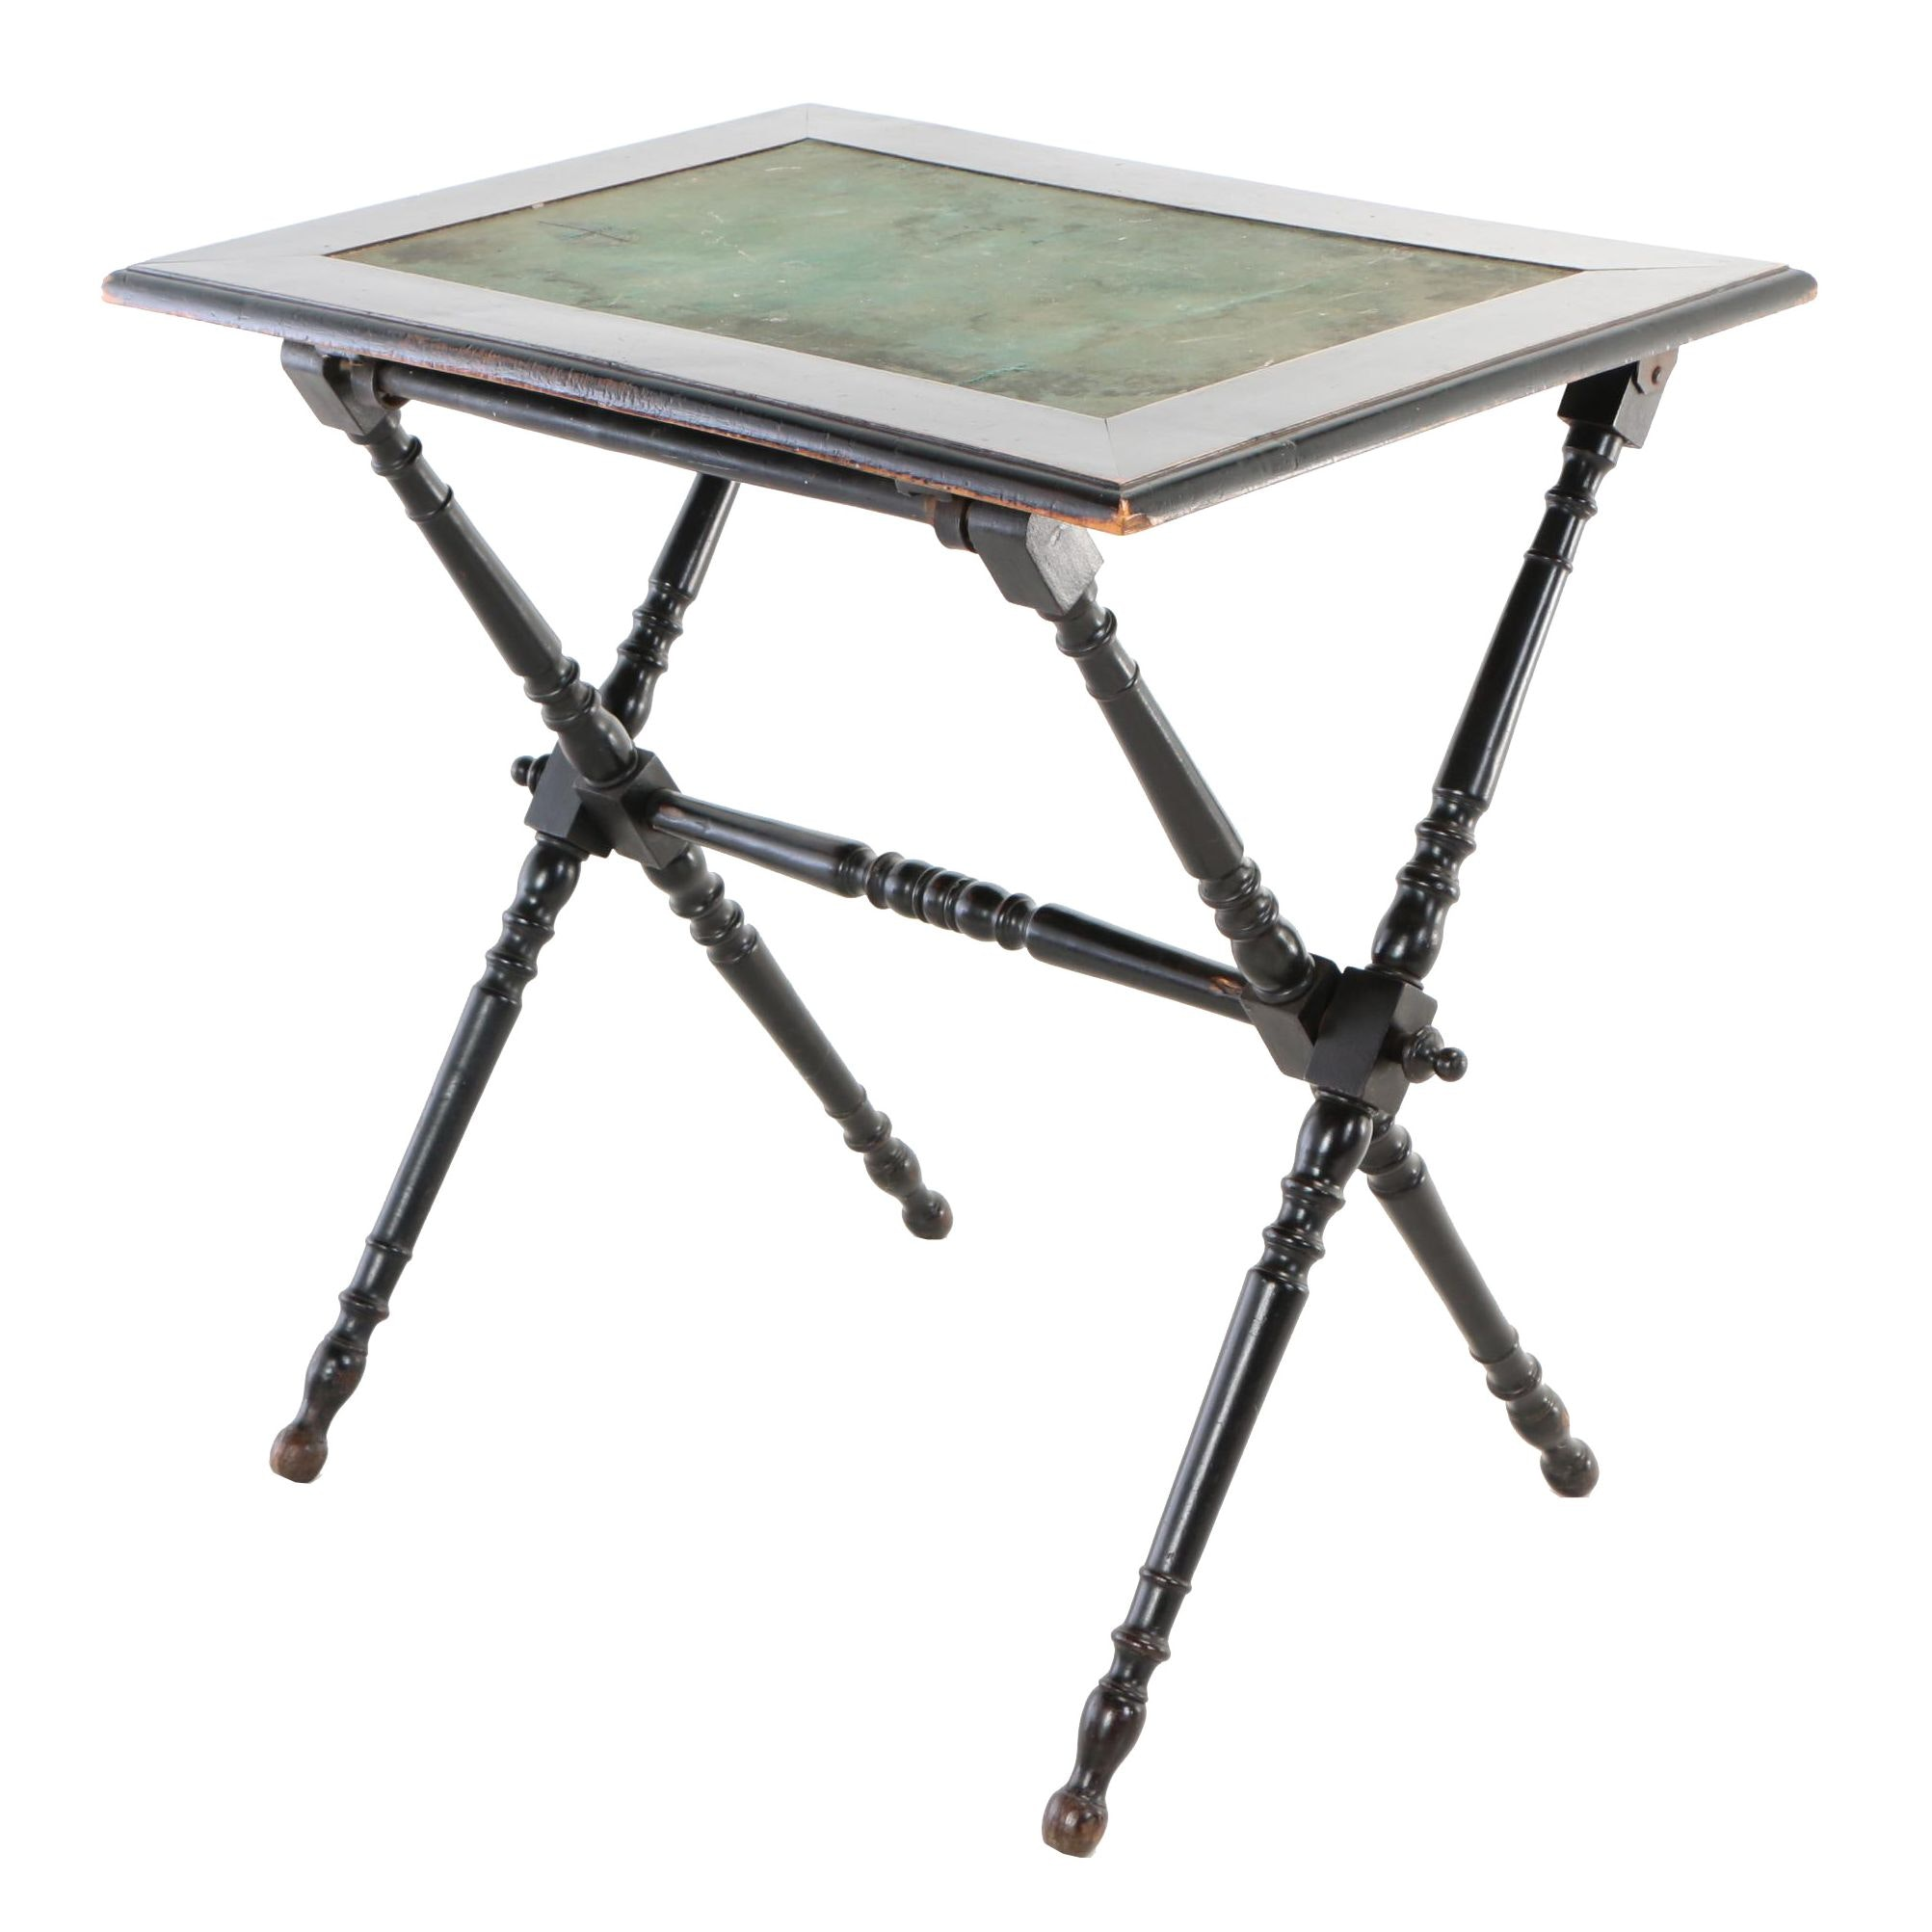 Victorian Ebonized Folding Side Table, Late 19th Century